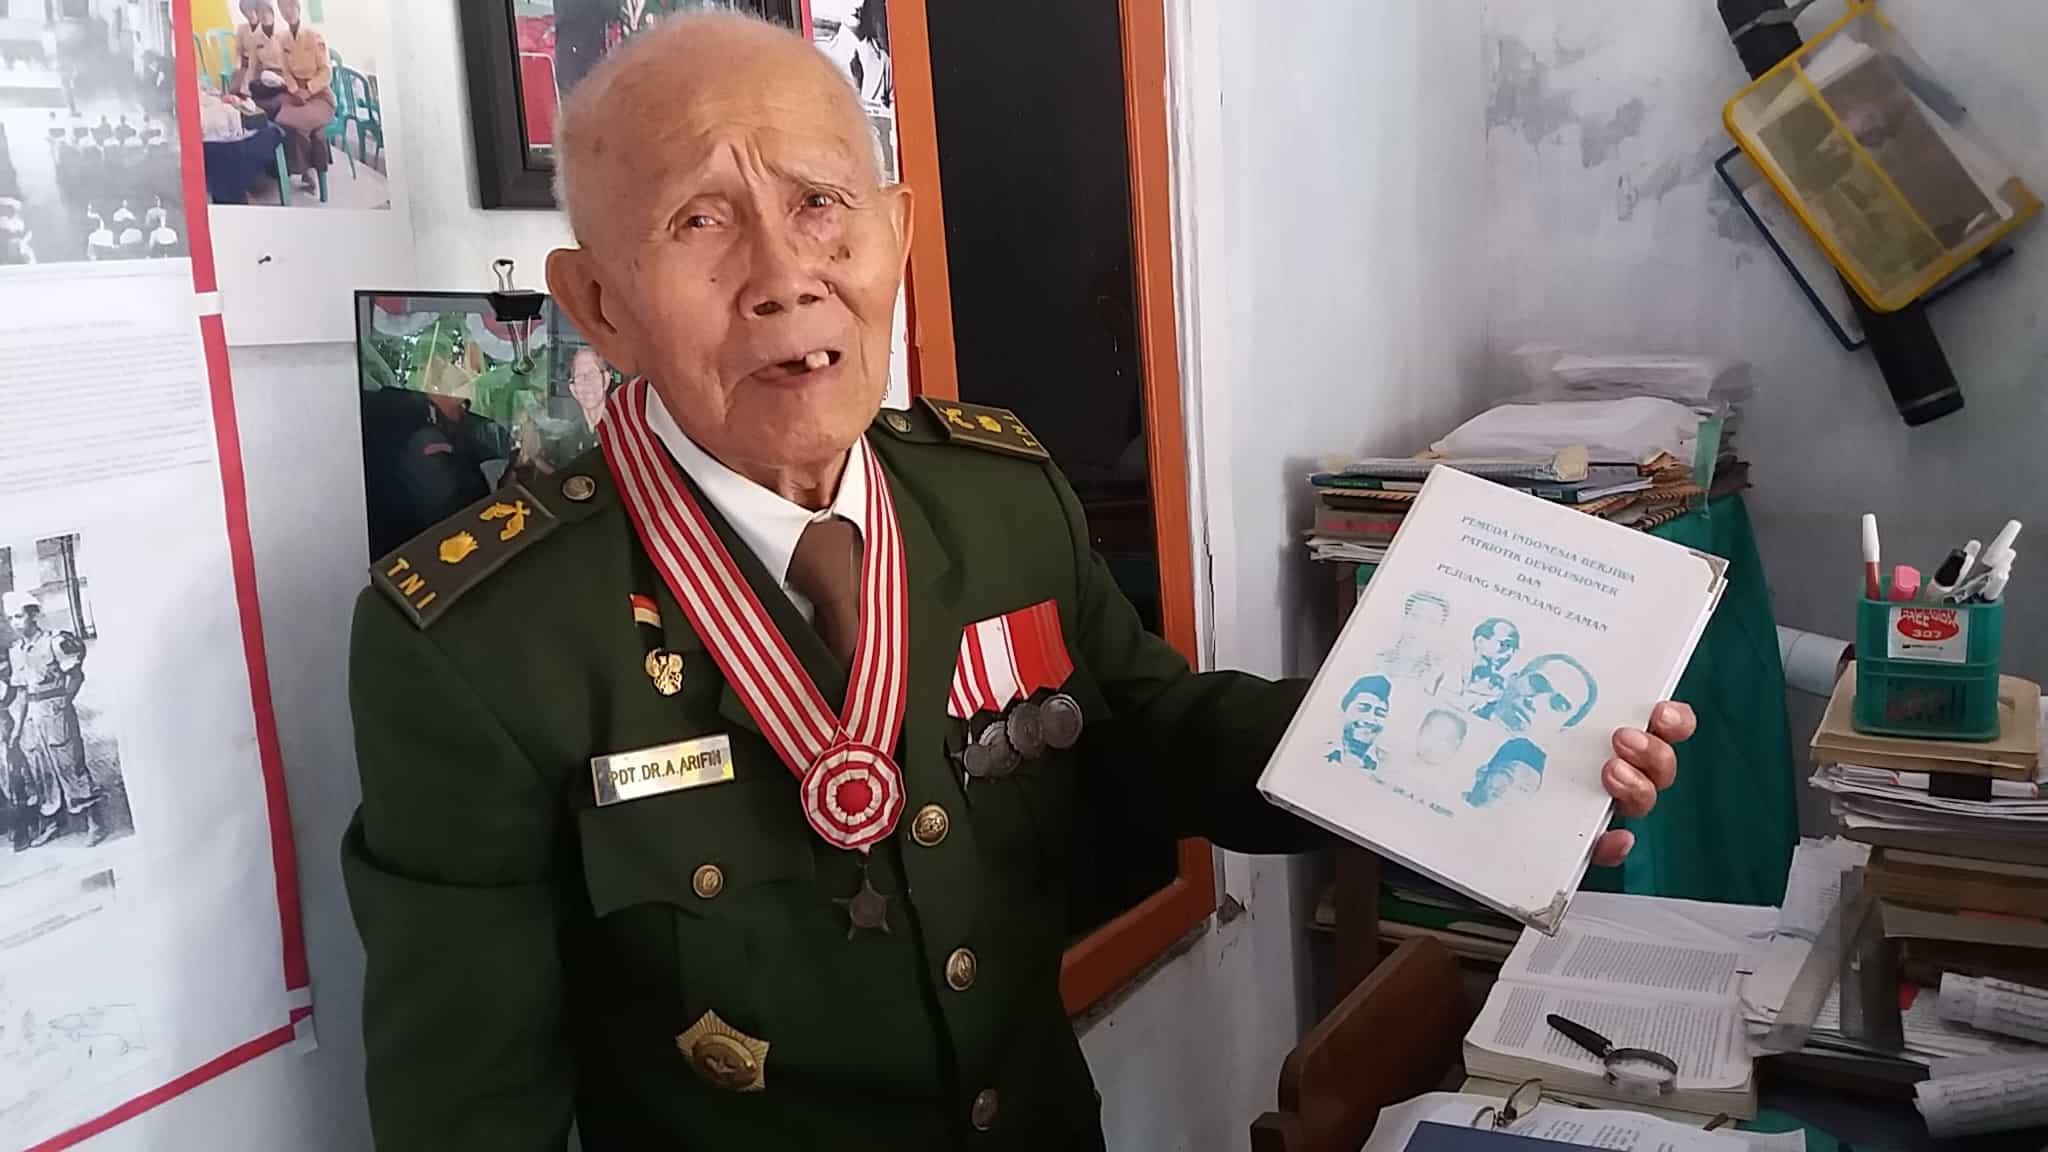 Ajudan II Panglima Besar Jenderal Soedirman Mayor Purnawirawan Abu Arifin membuat museum mini di ruang tamu rumahnya di Purbalingga. FOTO oleh Irma Muflikhah/Rappler